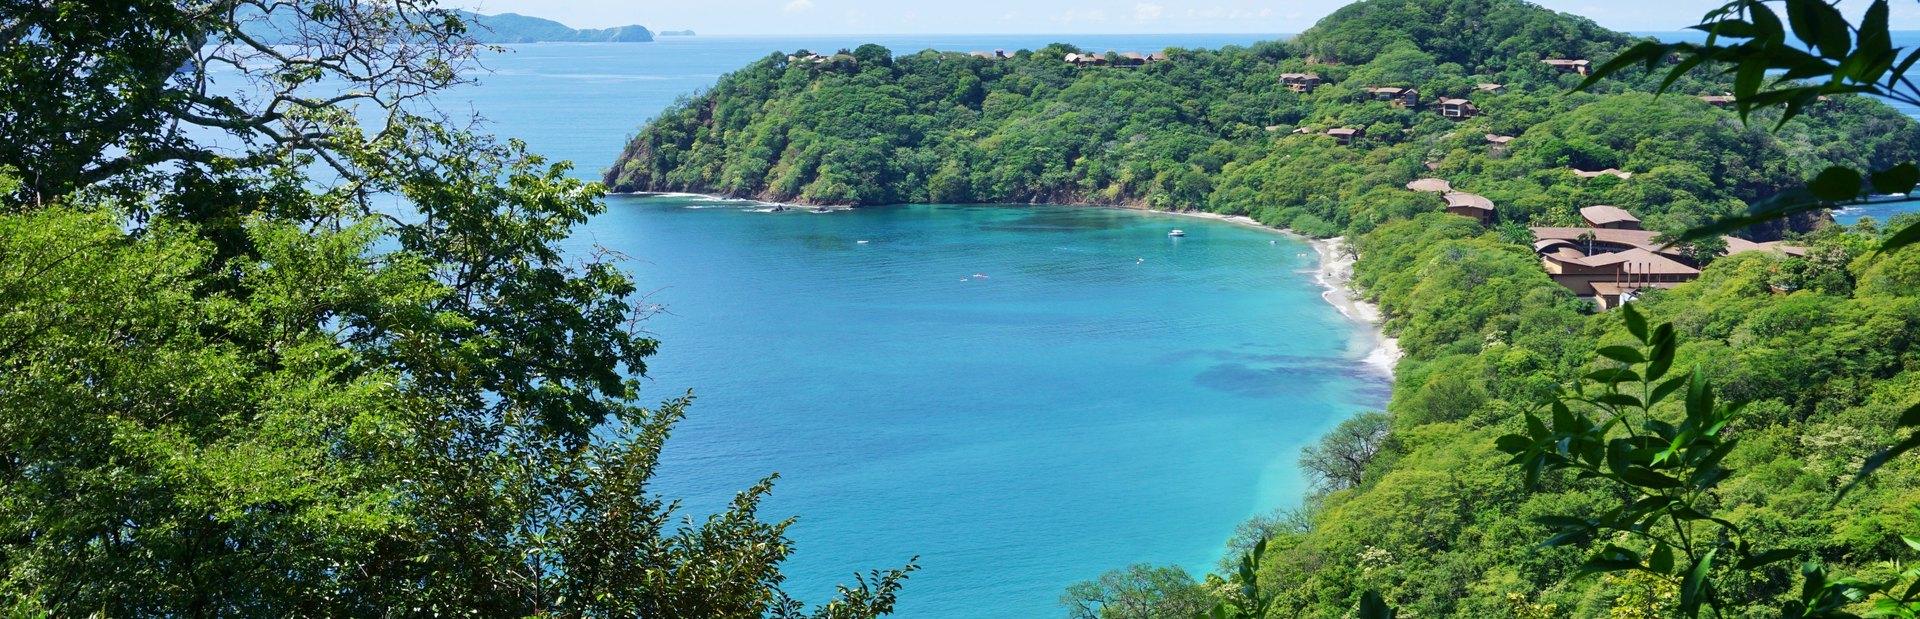 Four Seasons Resort Costa Rica Image 1